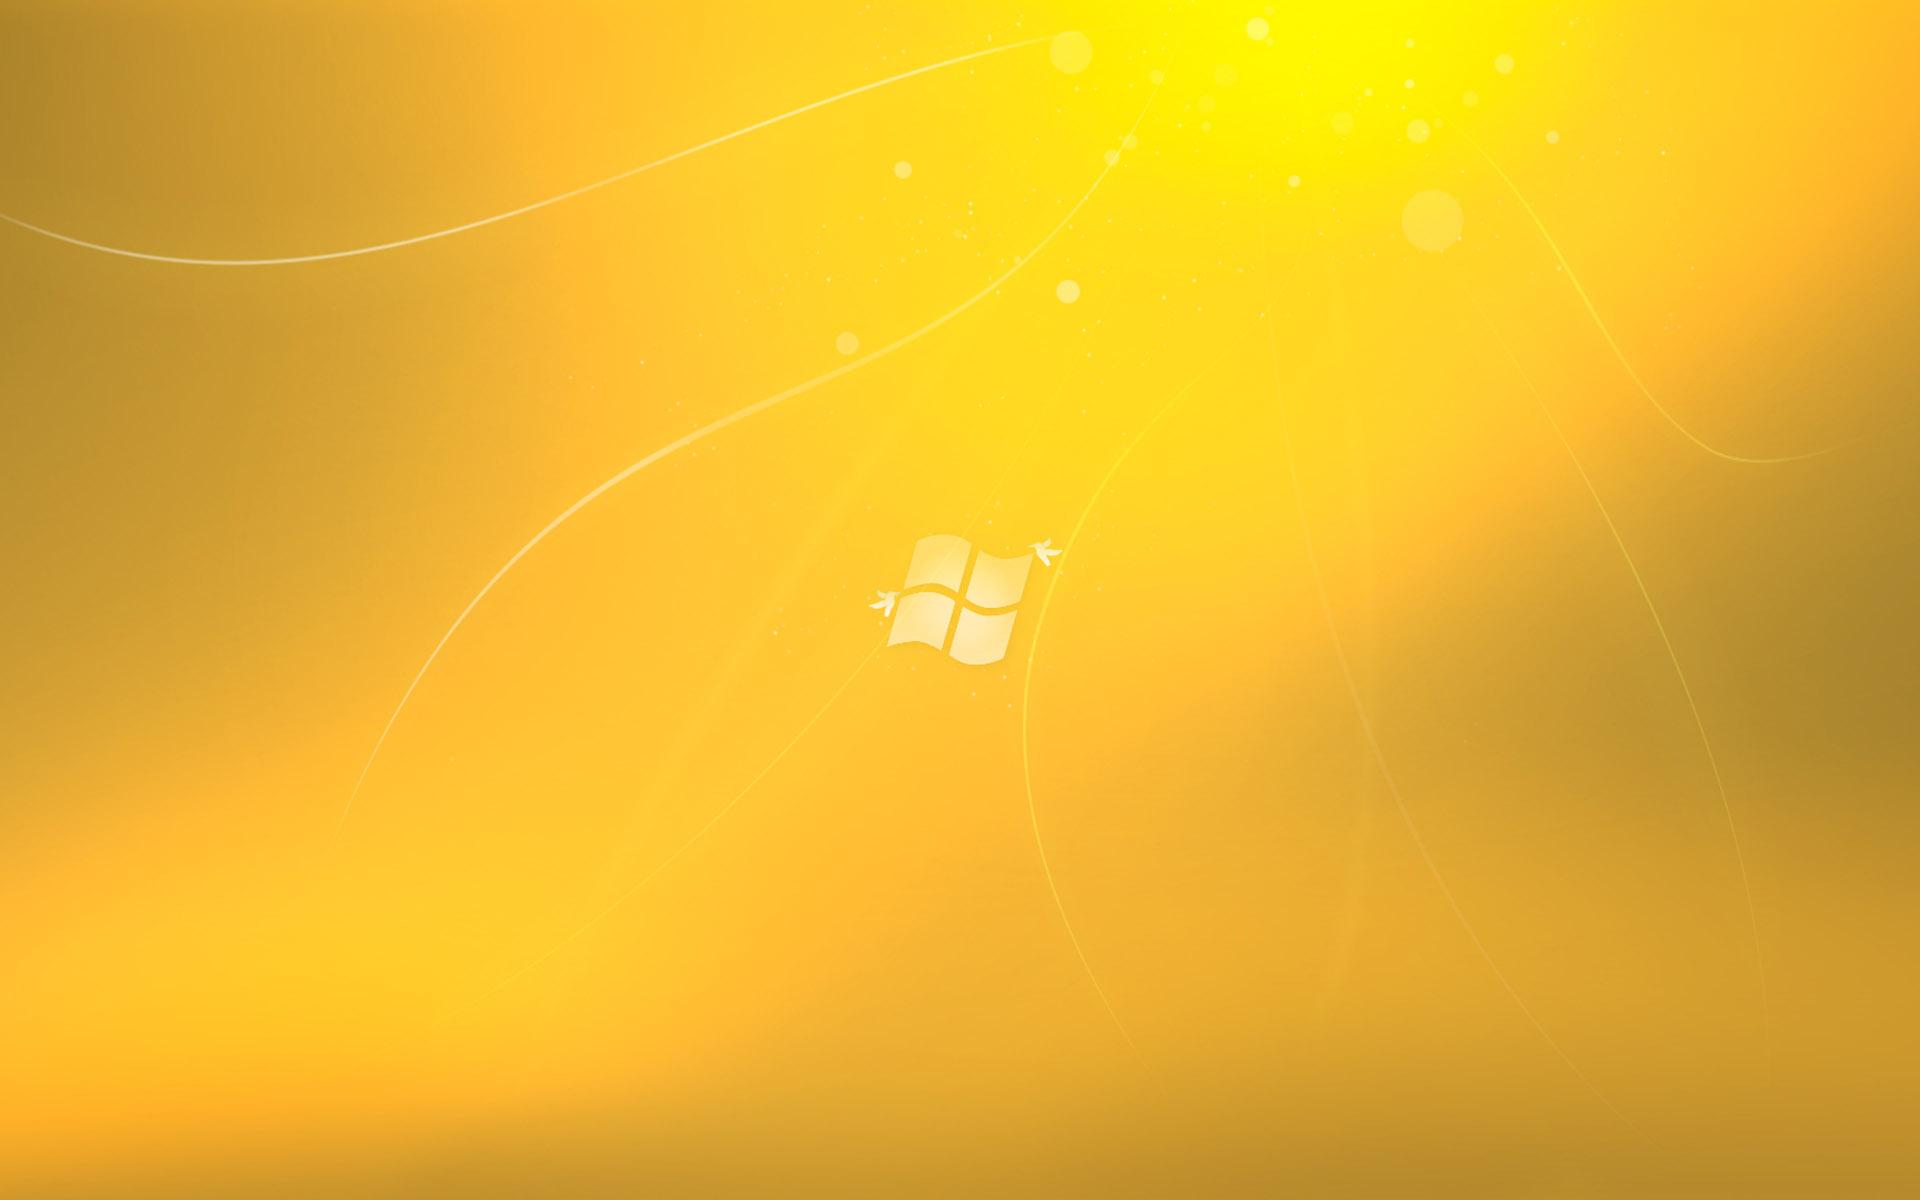 Window 7 HD Gold Yellow desktop wallpaper WallpaperPixel 1920x1200